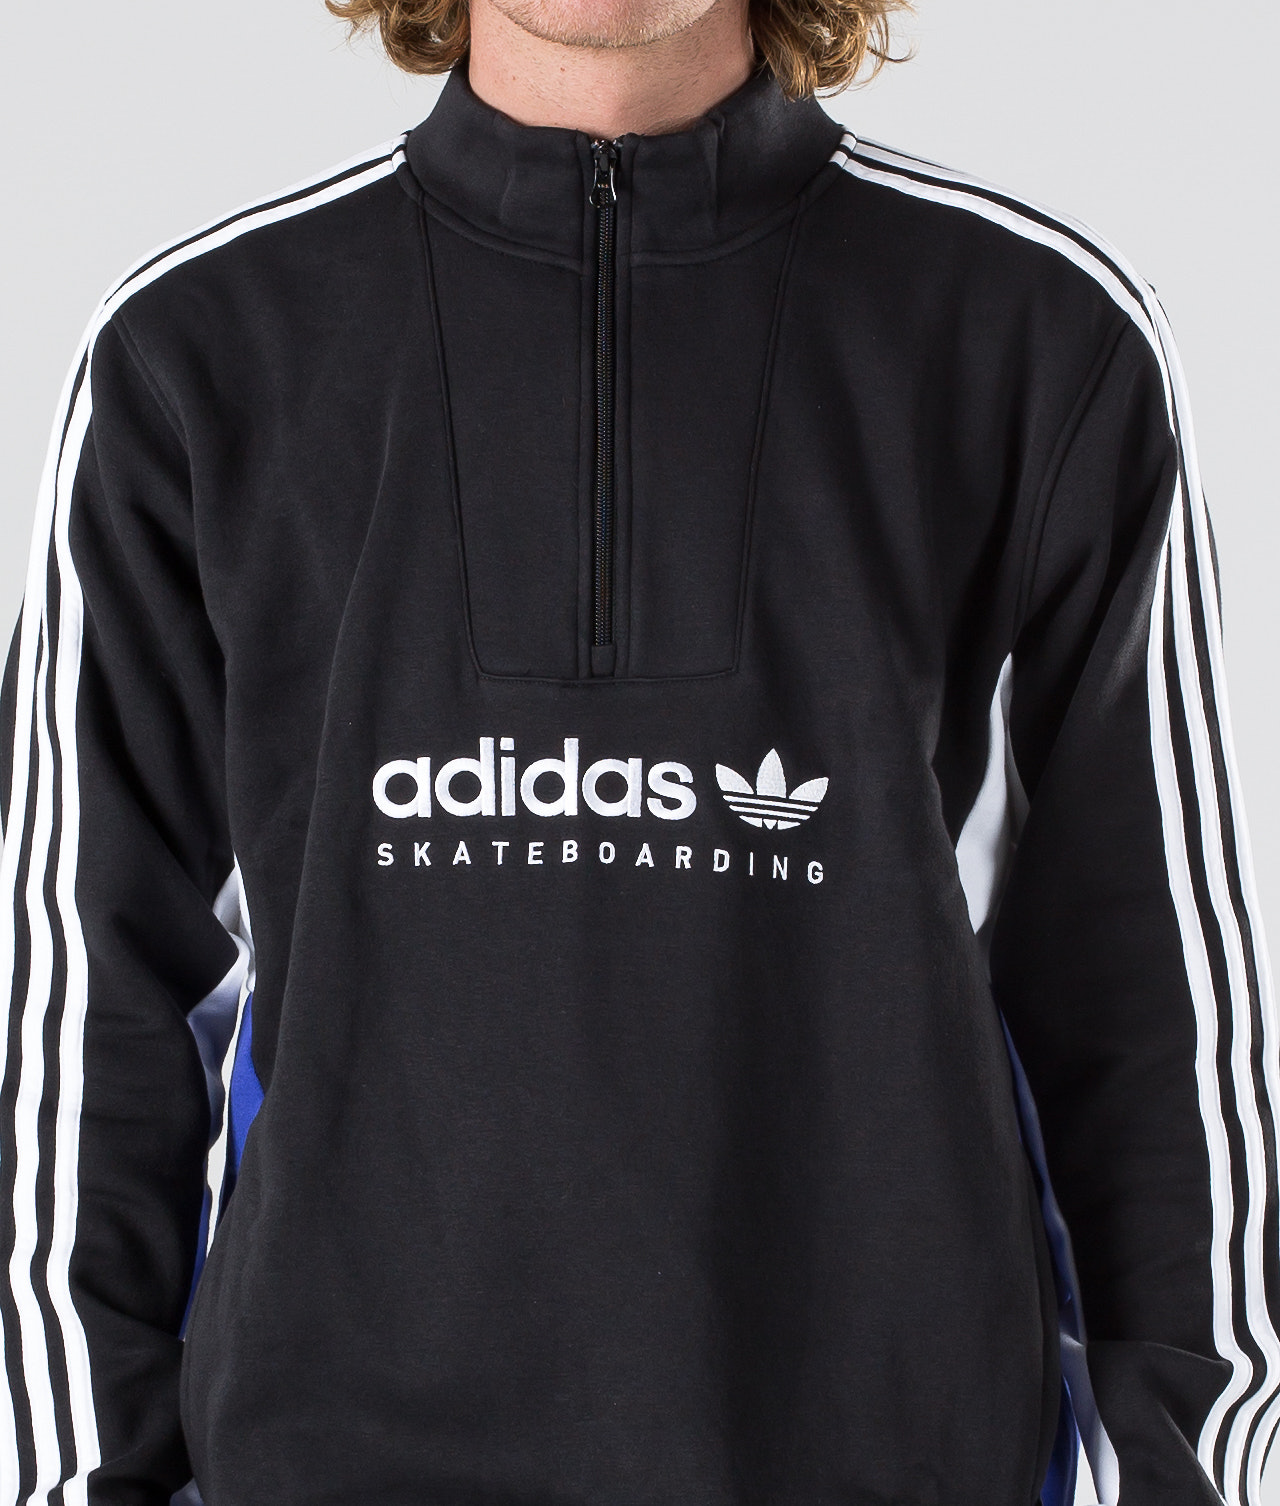 7113034faa Adidas Skateboarding Apian Sweater Black White Active Blue ...